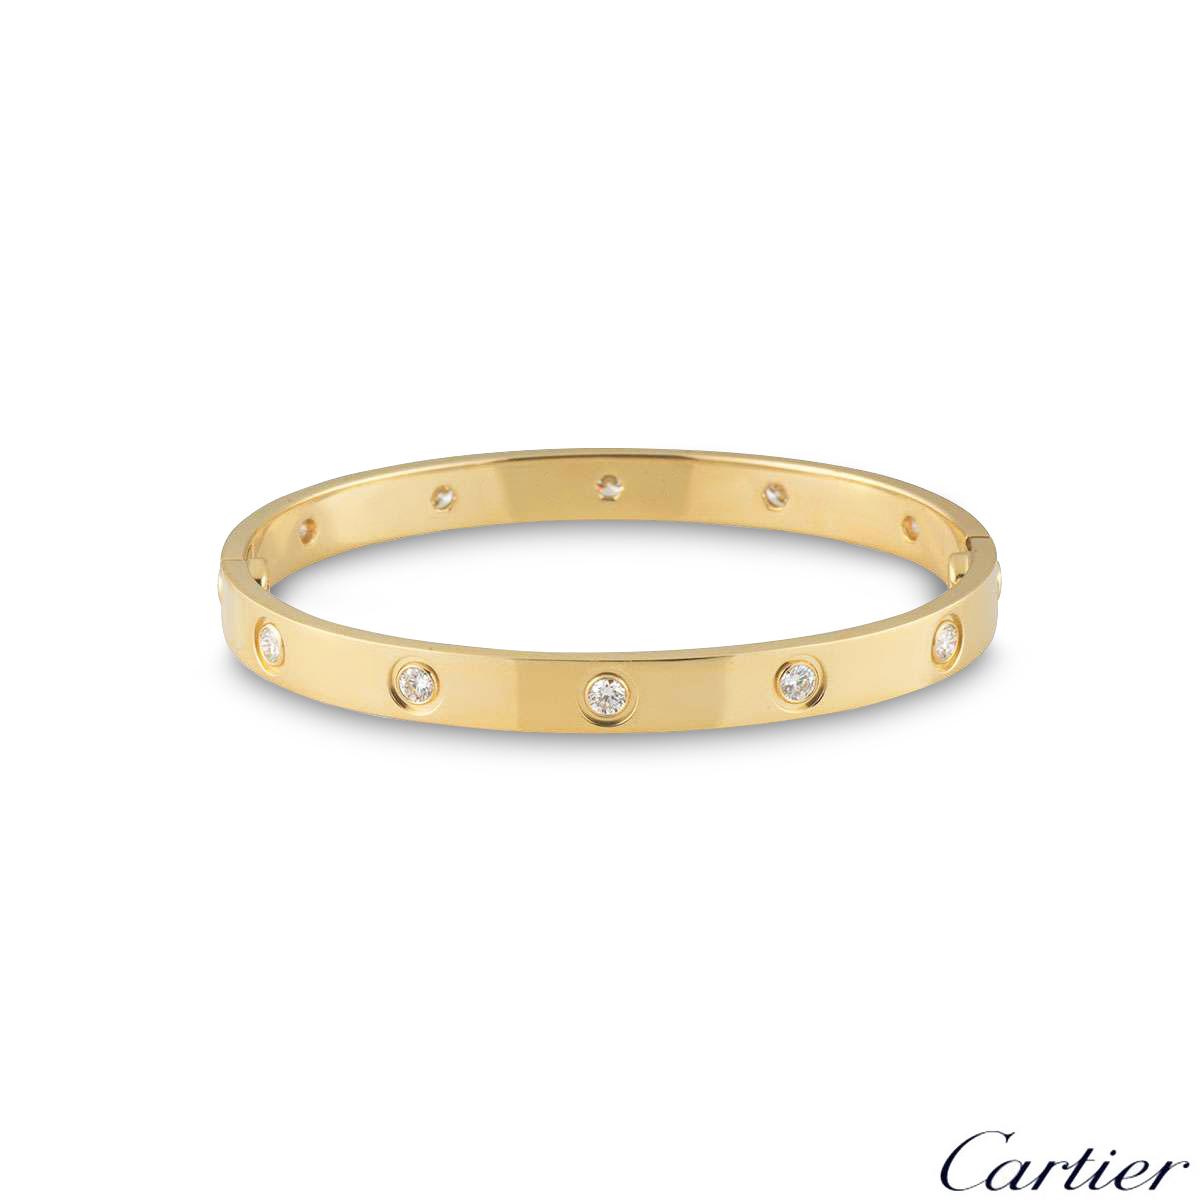 Cartier Yellow Gold Full Diamond Love Bracelet Size 17 B6040517